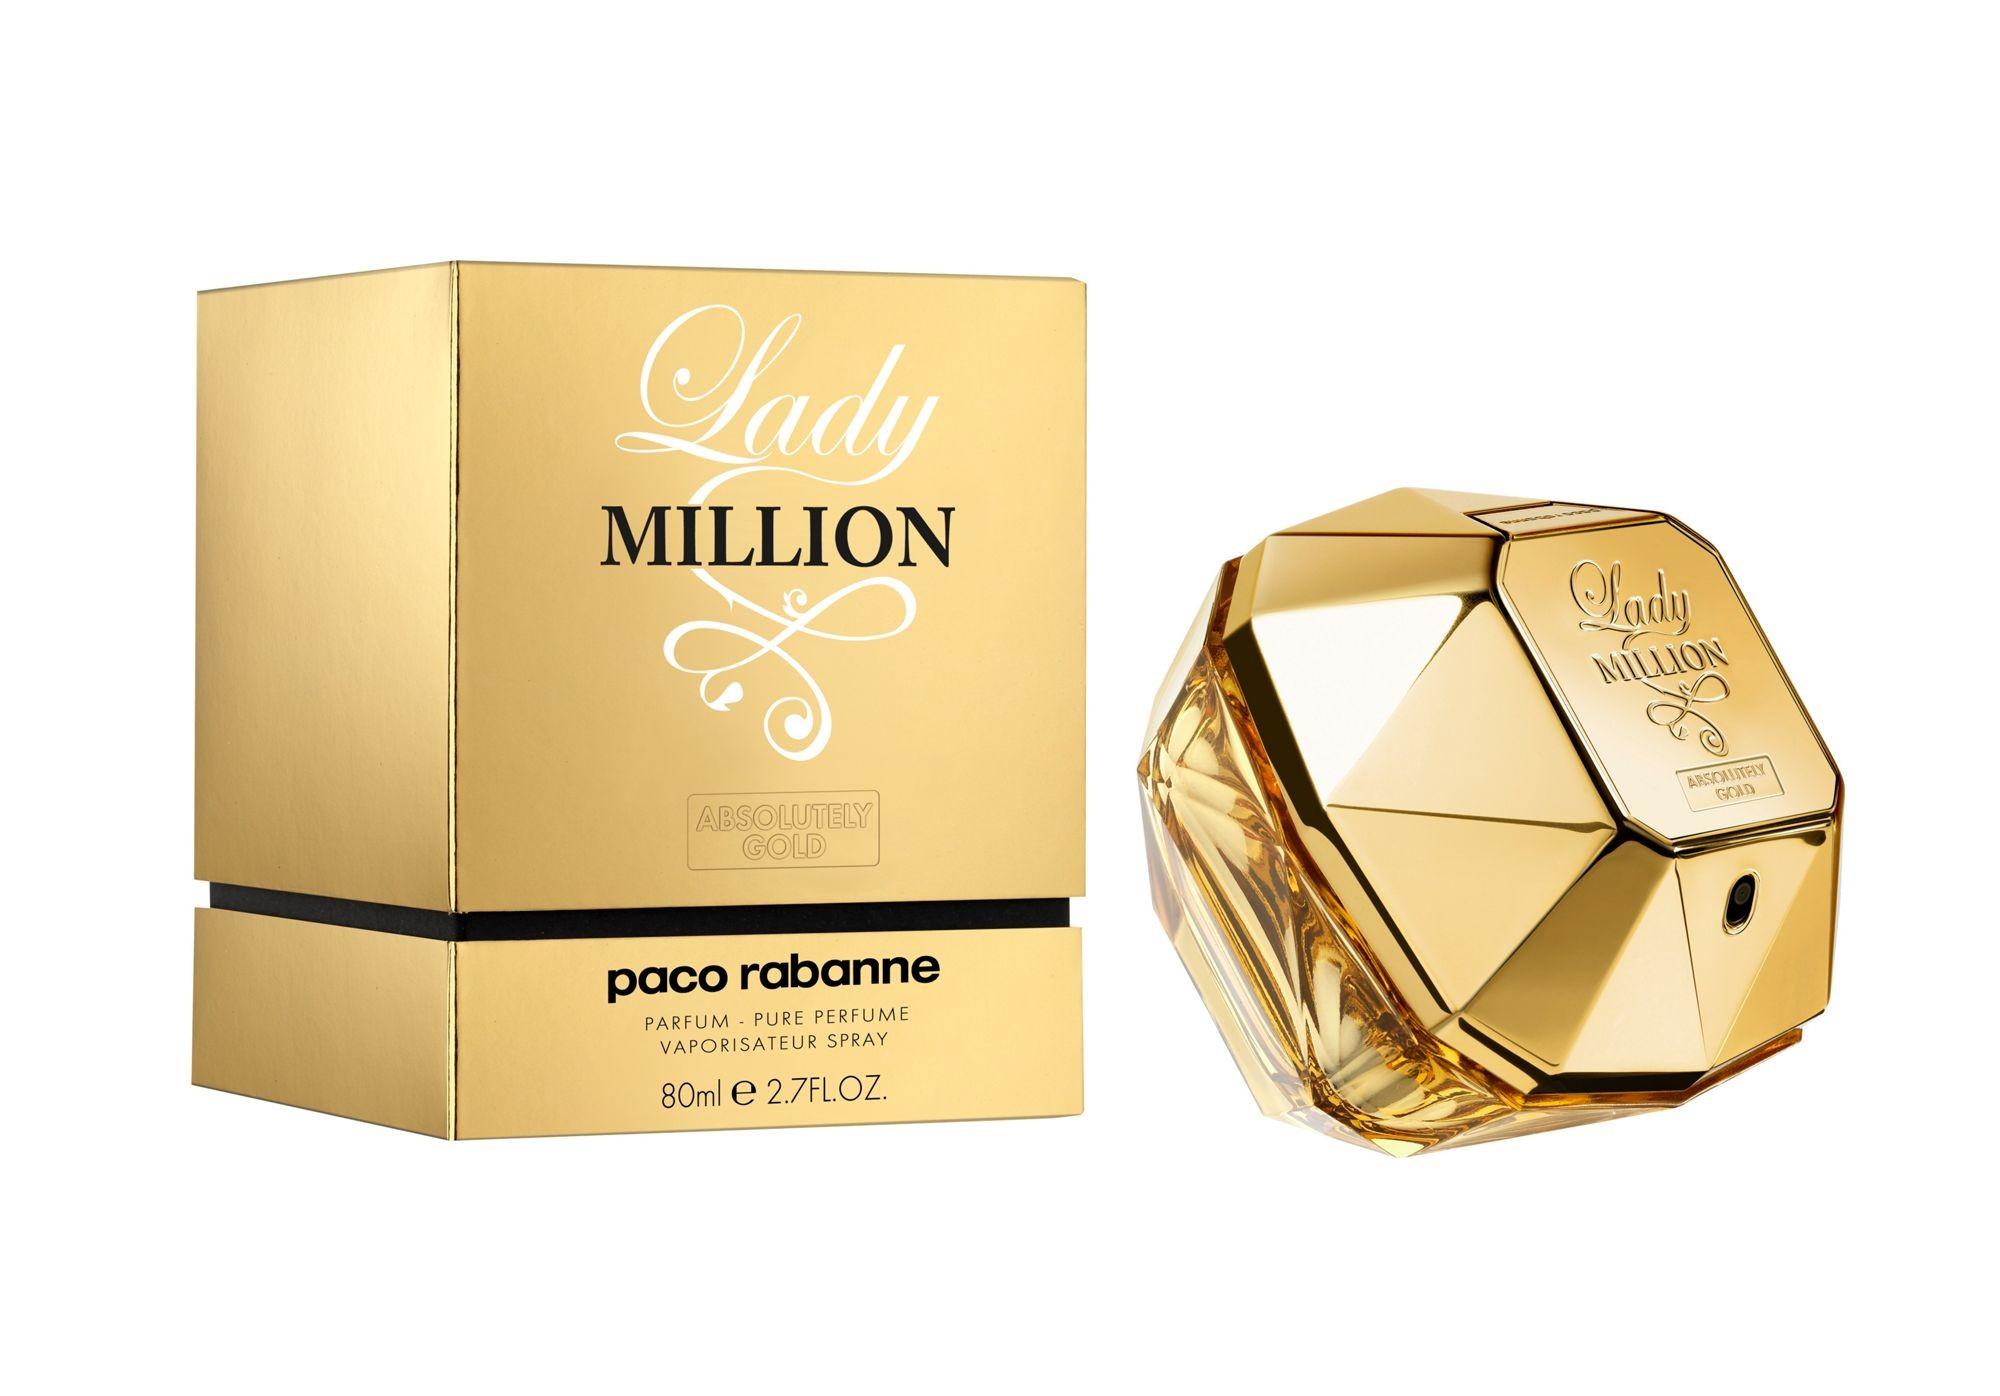 letnie perfumy paco rabanne lady million abs gold